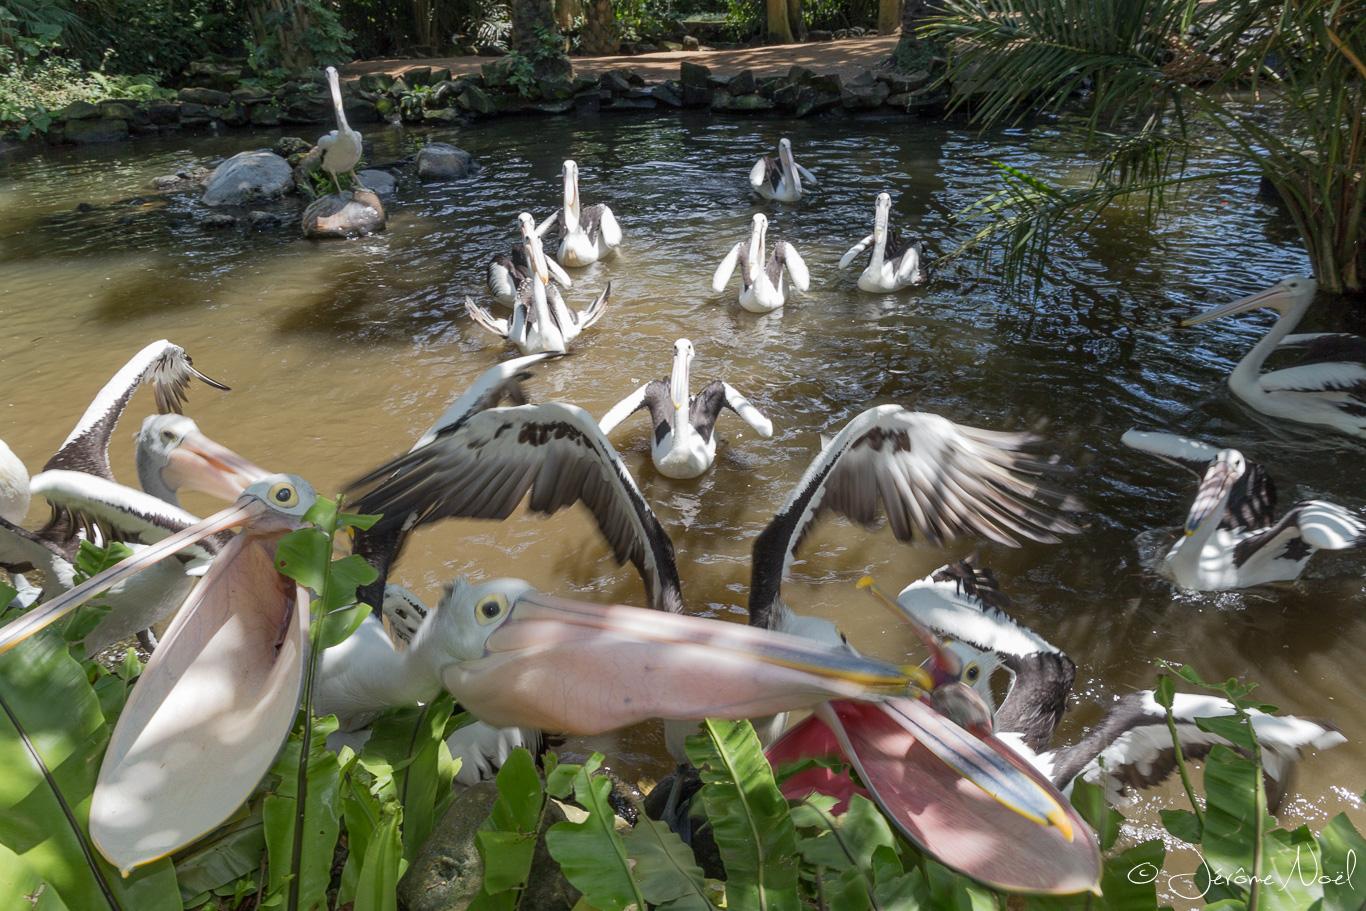 Bali Bird Park - Repas des pélicans